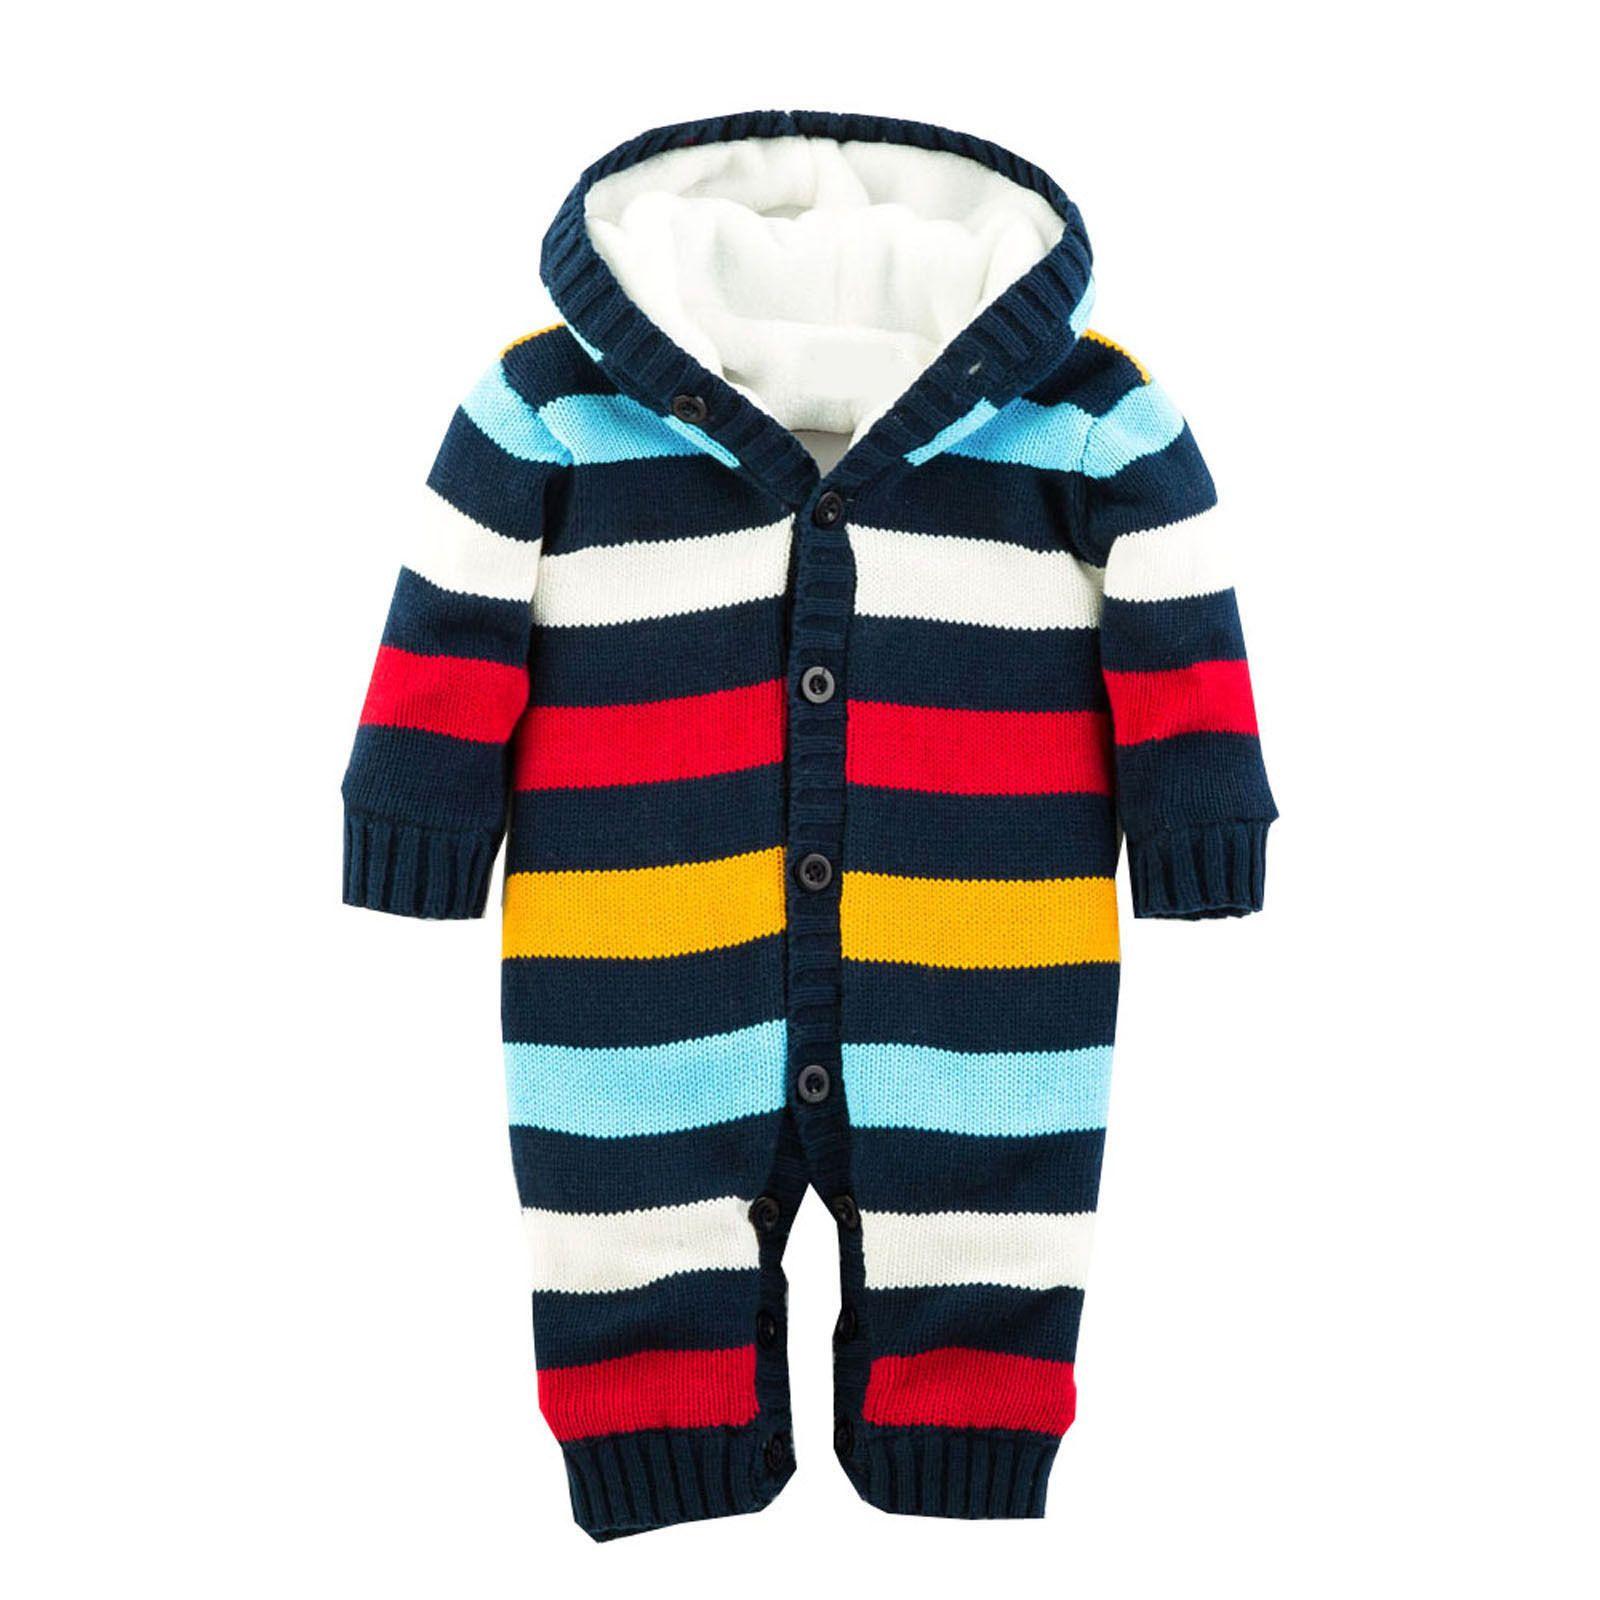 Winter Newborn Baby Romper Boys Girls Rompers Jumpsuit Warm Thick